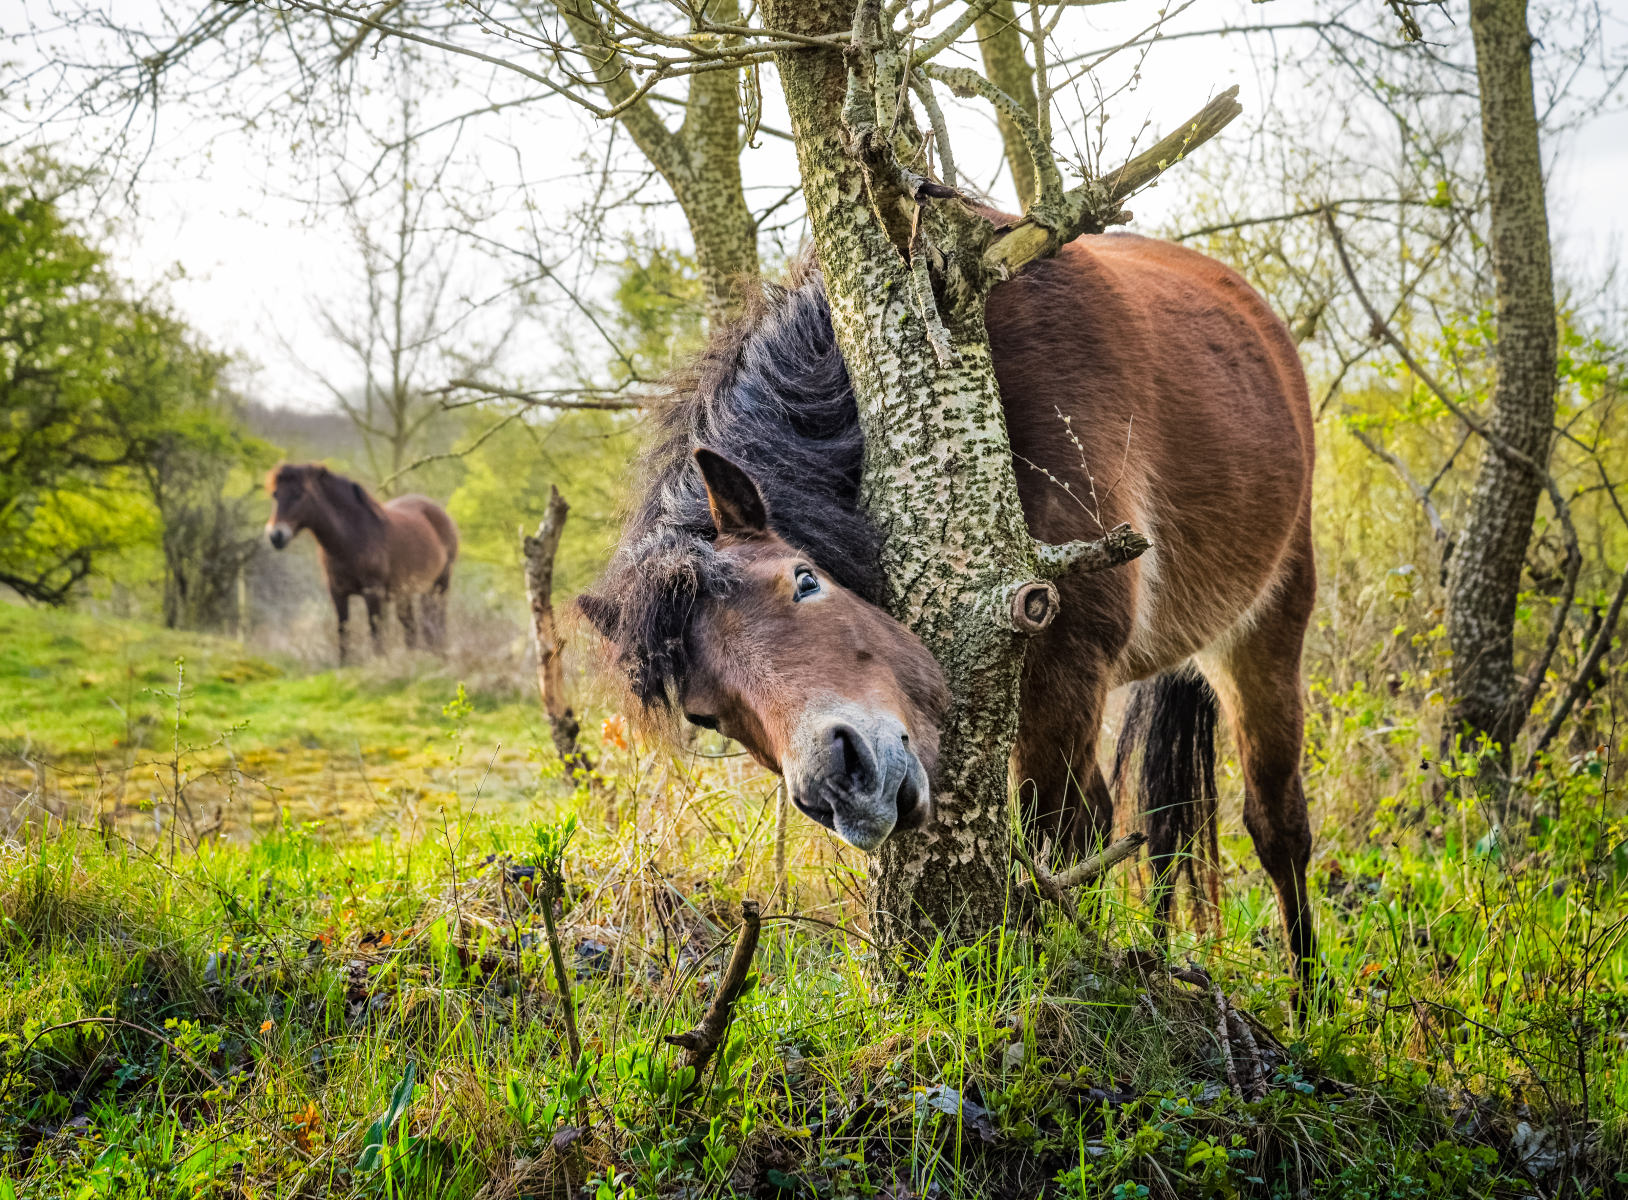 horse scratching itself on a silver poplar